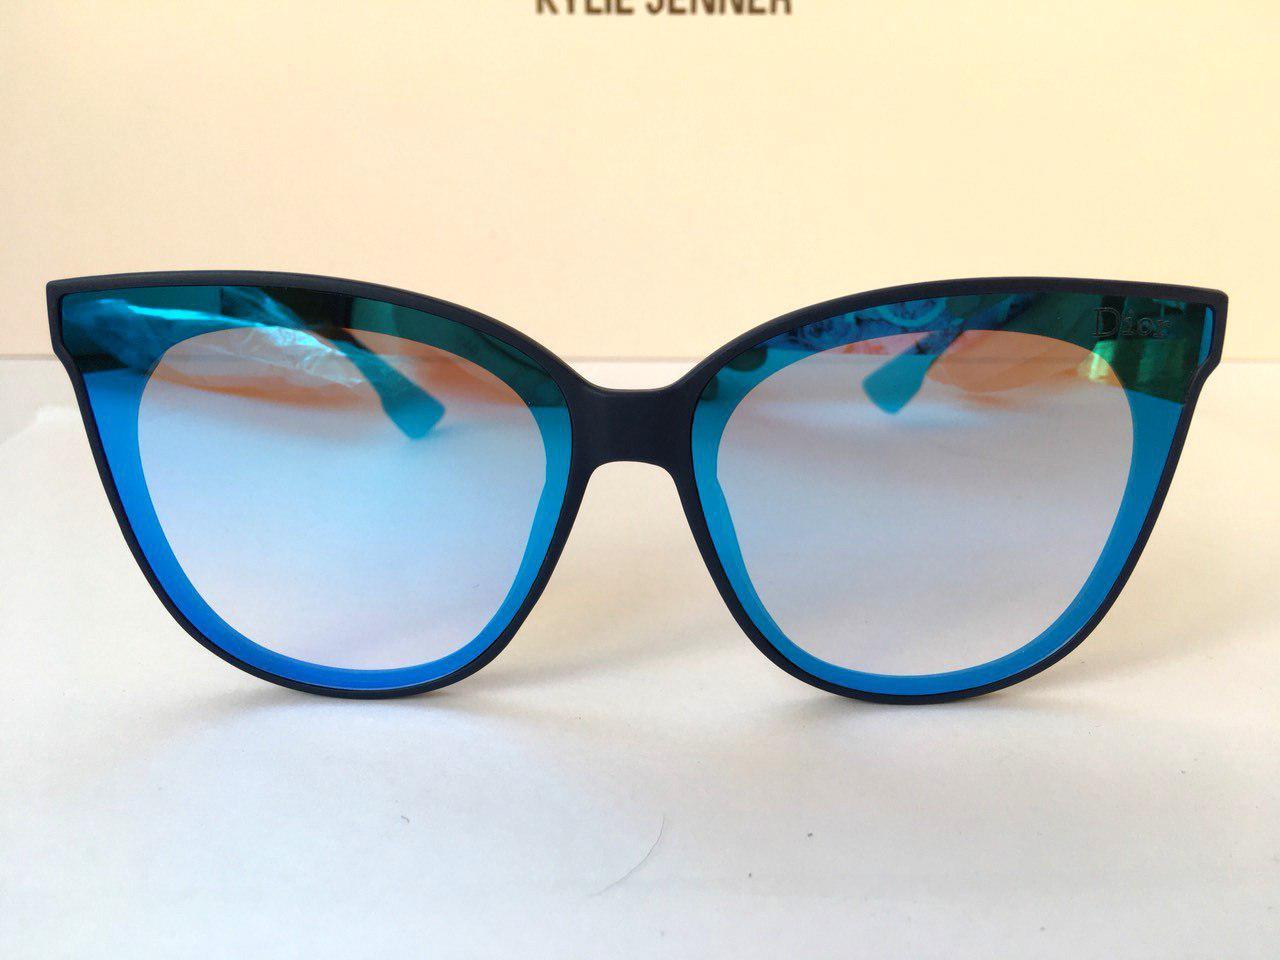 f50f7199d3fce Купить Солнцезащитные очки Dior (реплика) синие в Николаеве от ...